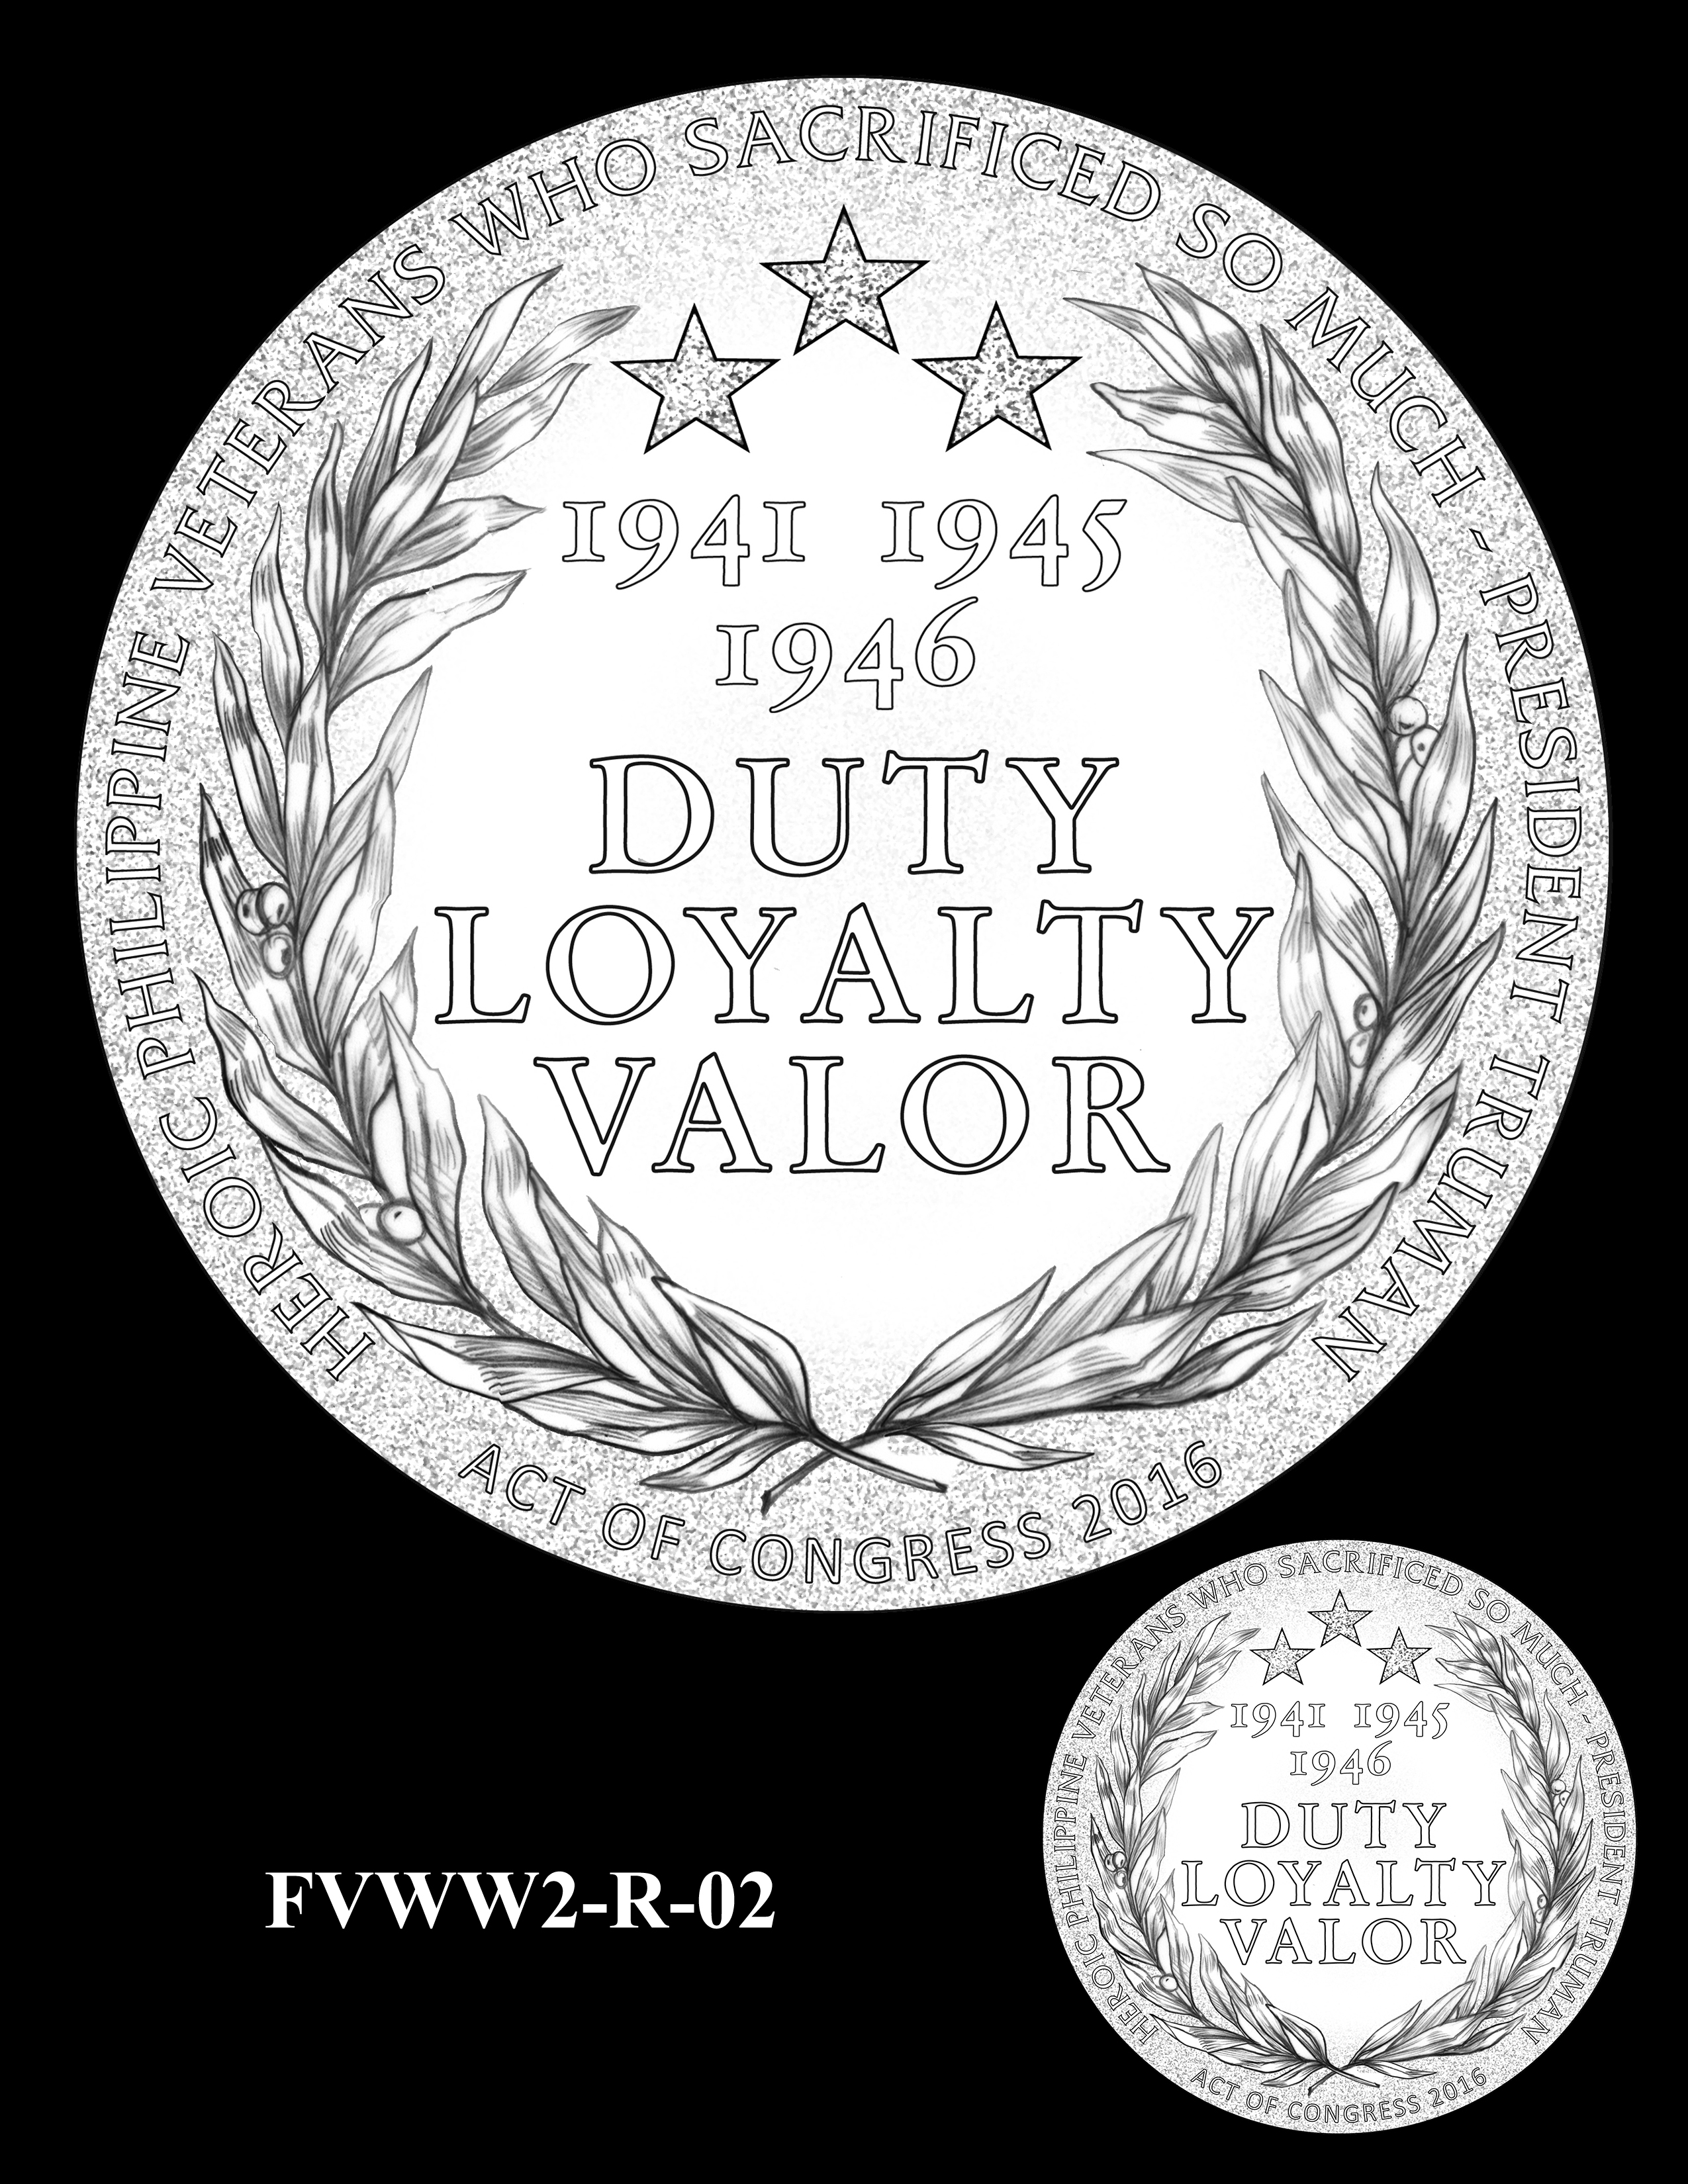 FVWW2-R-02 -- Filipino Veterans of World War II Congressional Gold Medal